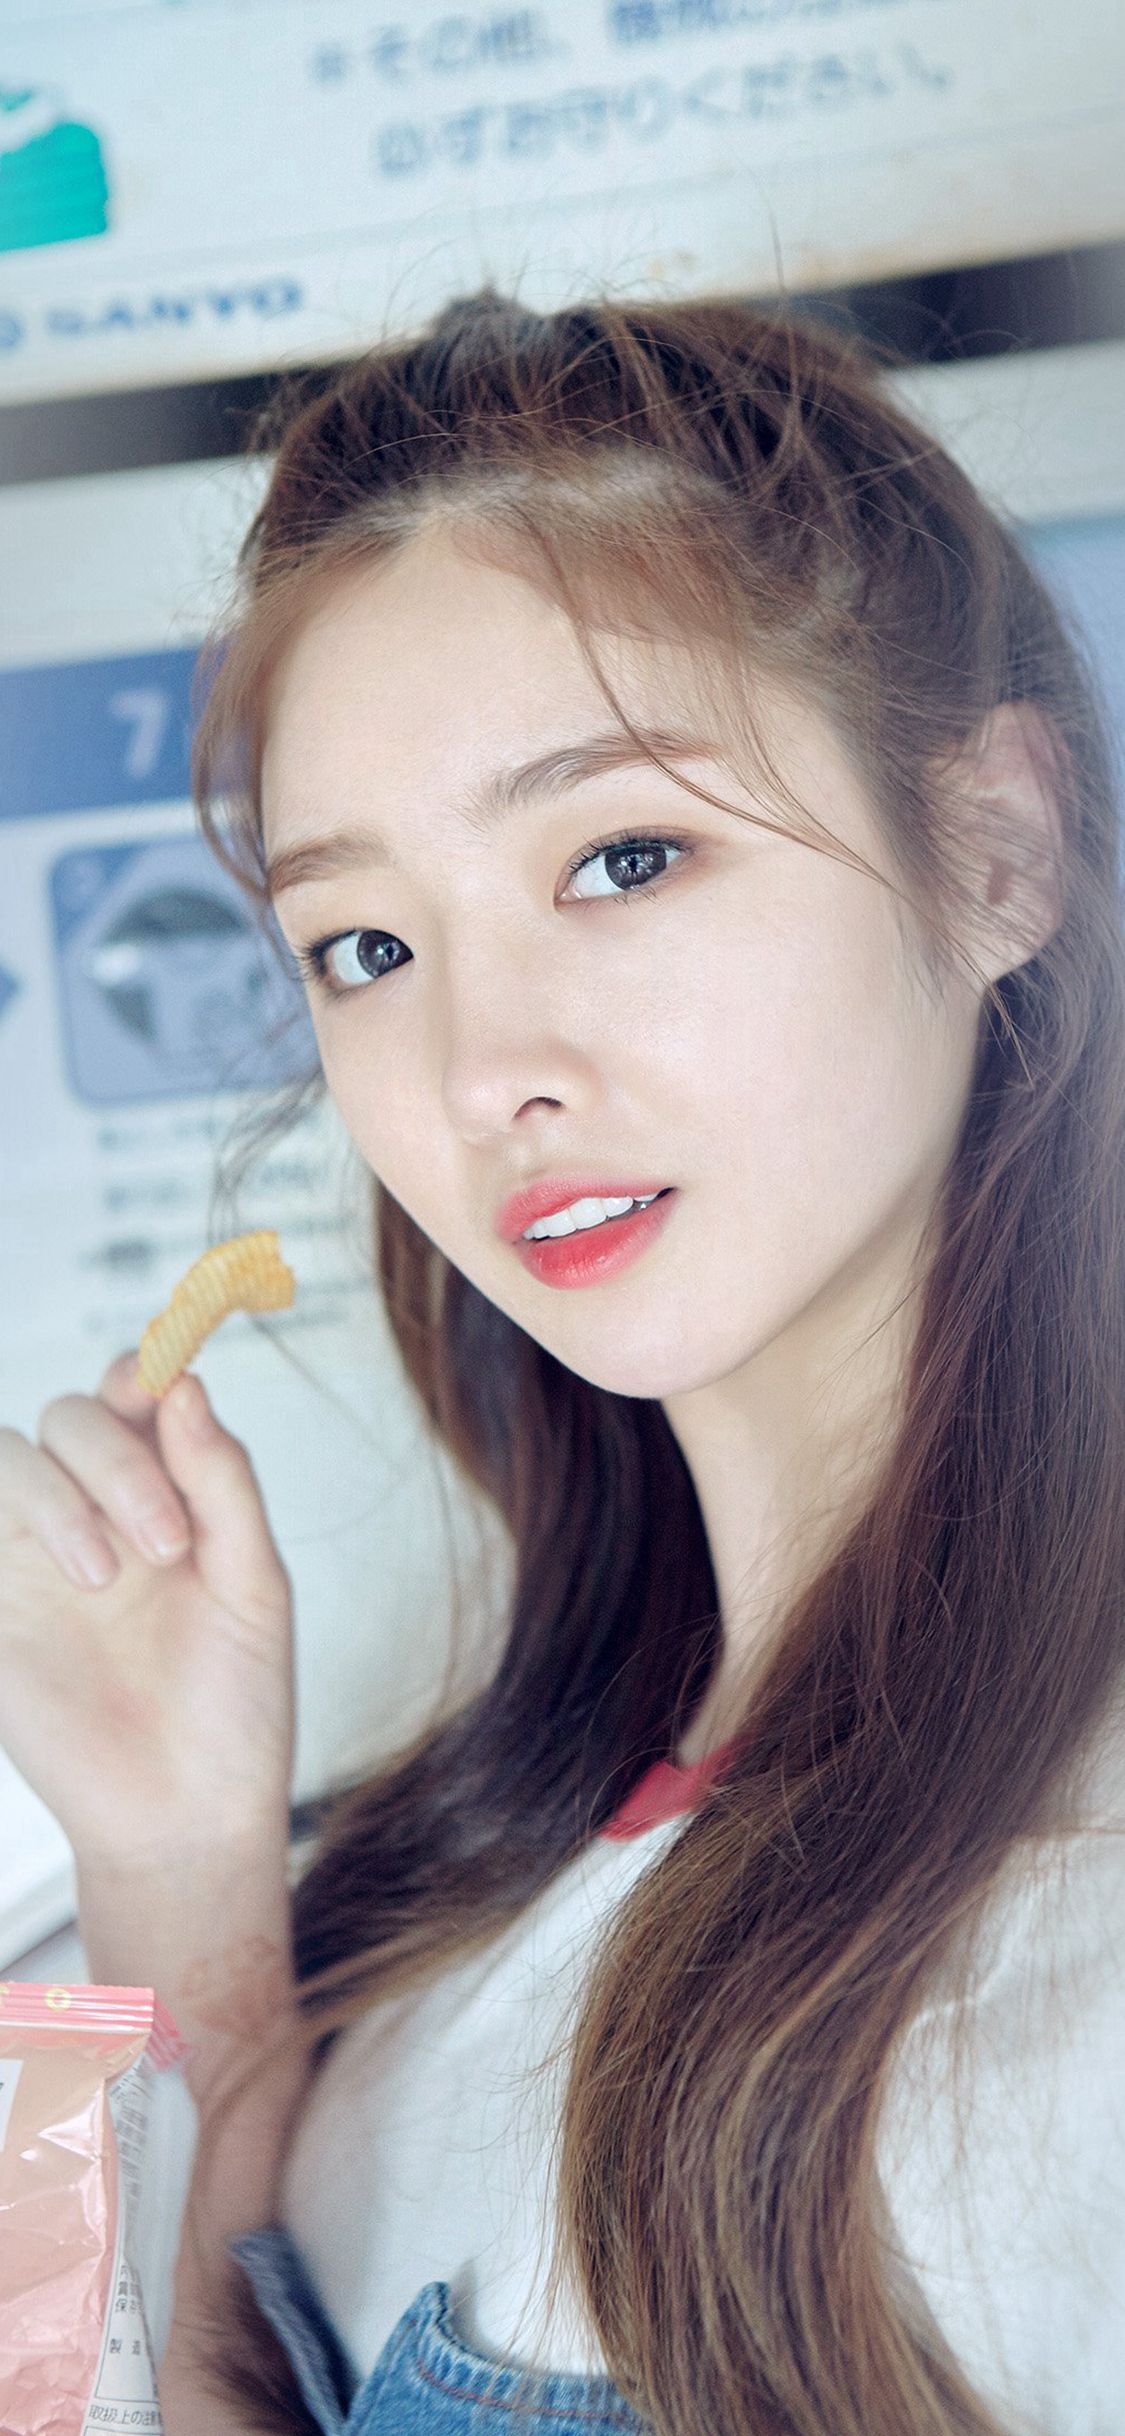 Kpop Girl Wallpapers Top Free Kpop Girl Backgrounds